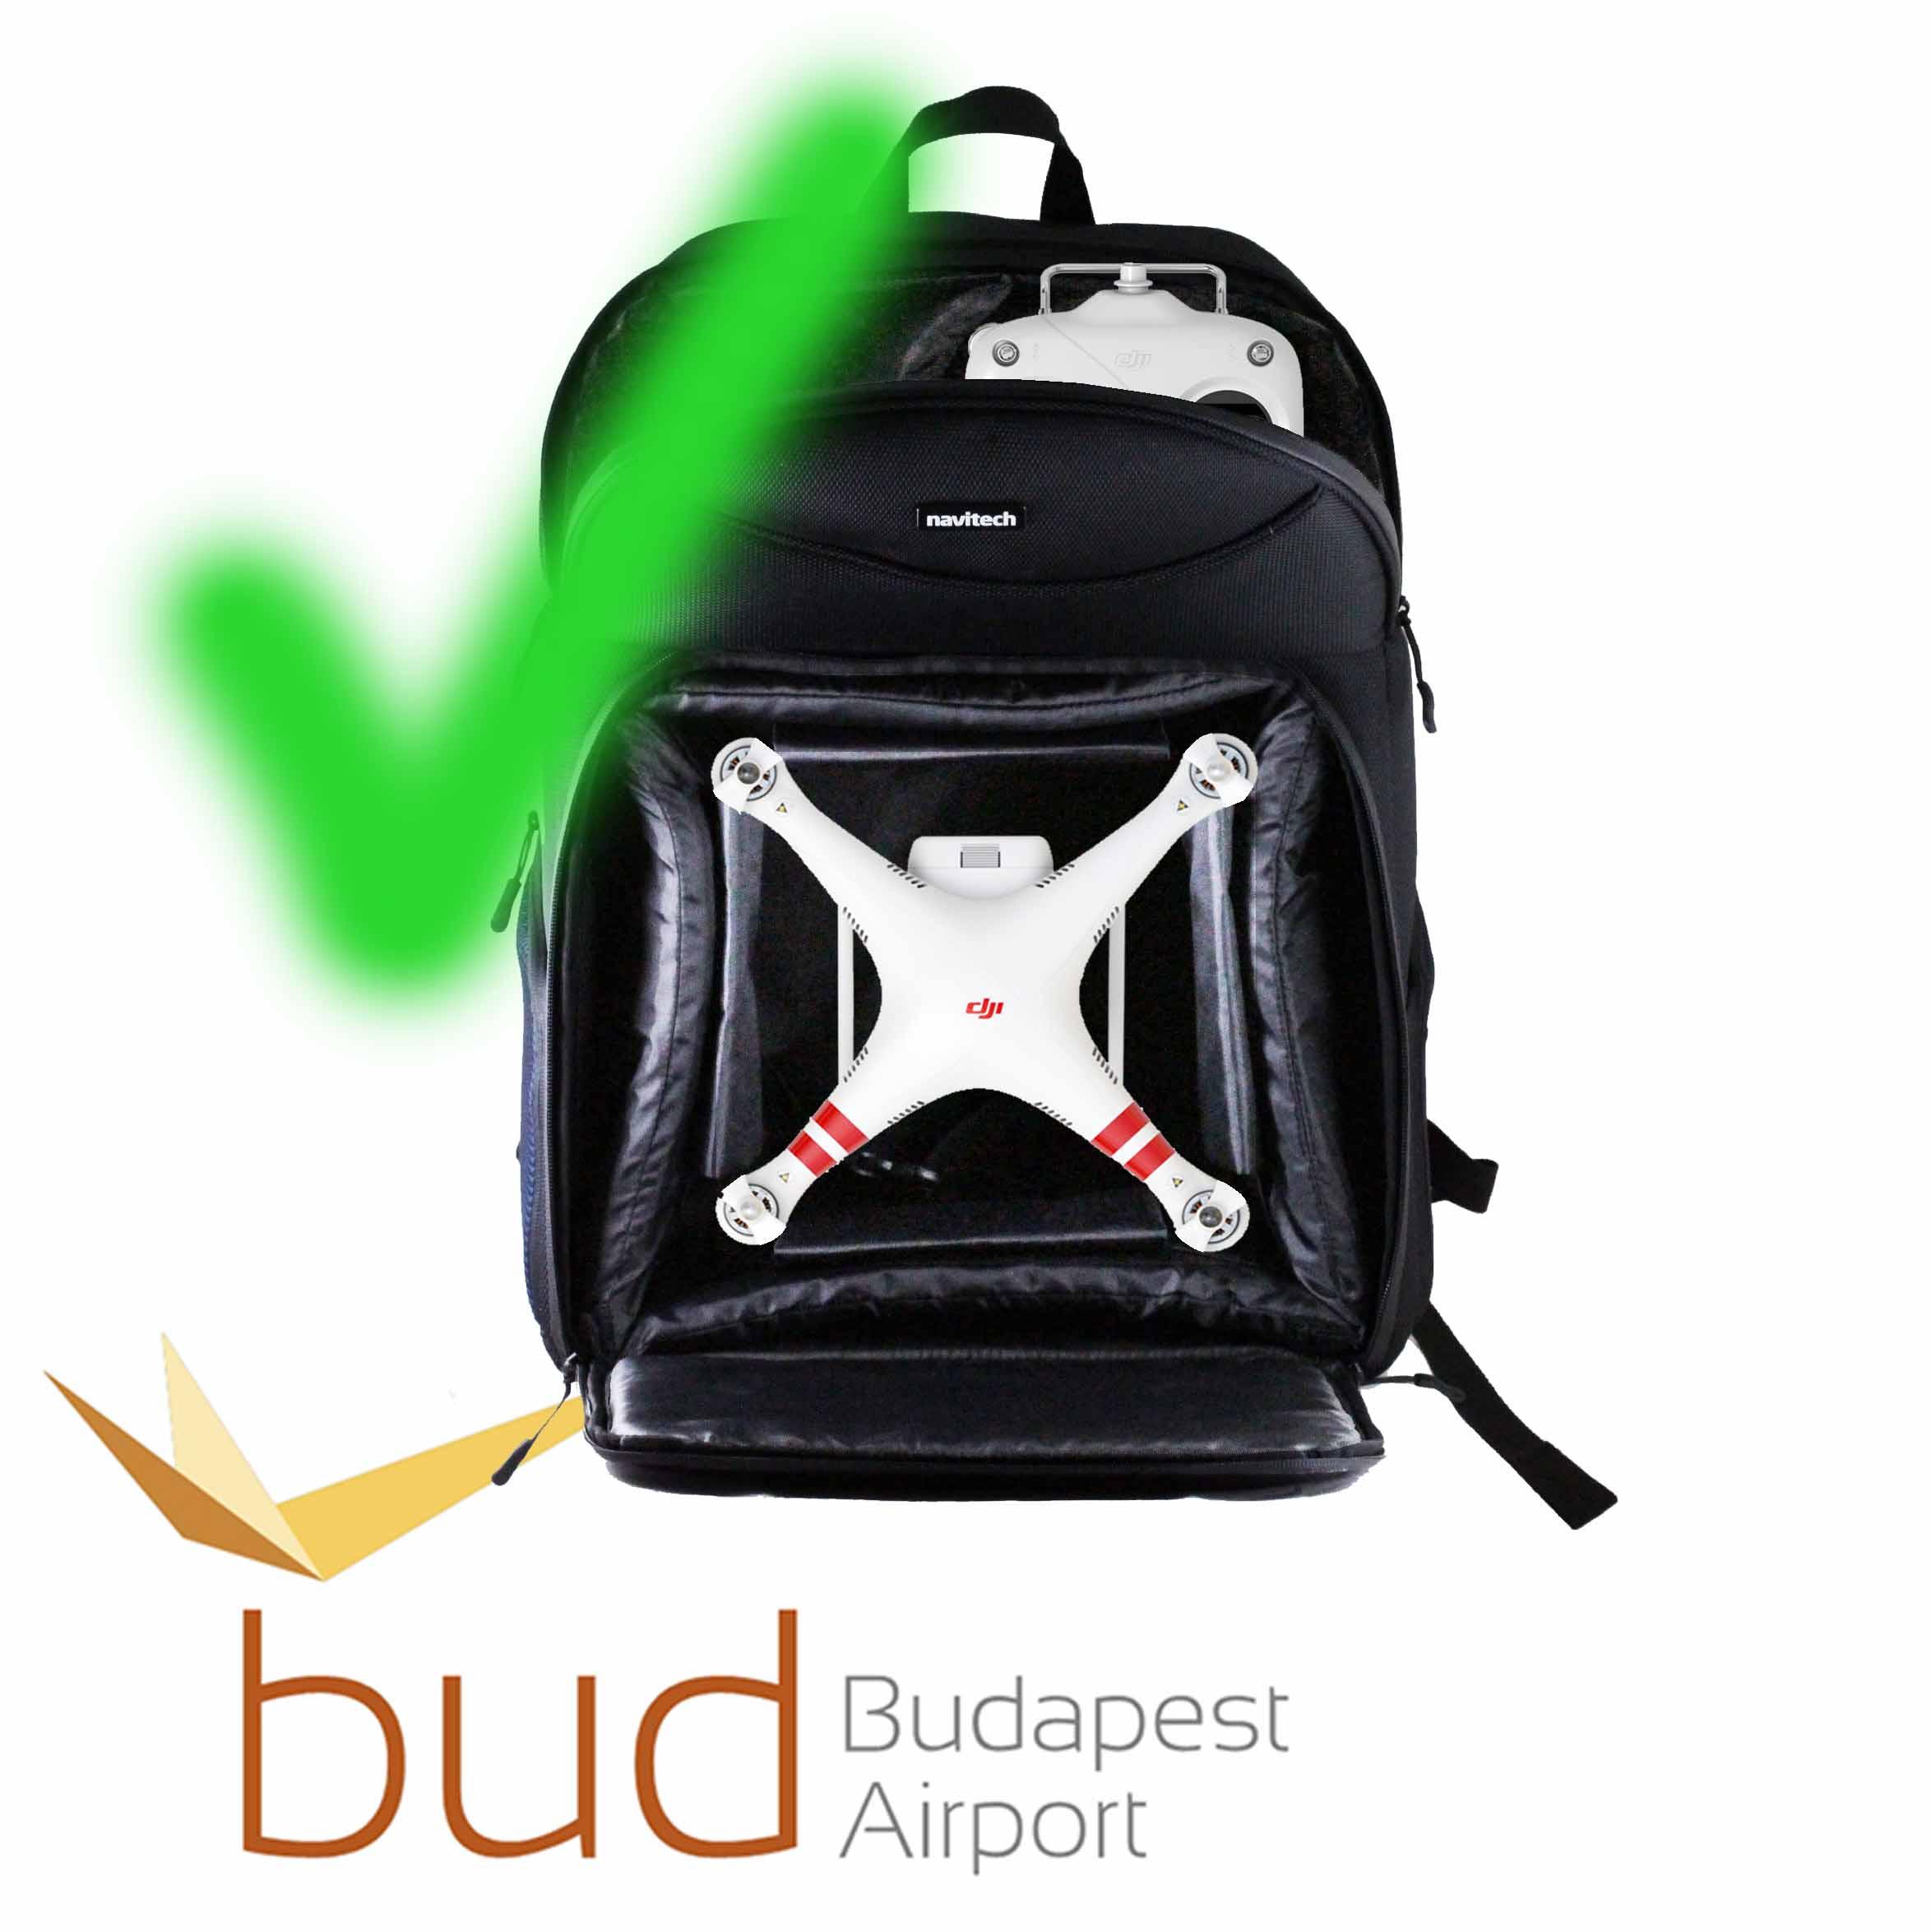 bud-budapestairport-dron-kezipoggyaszok.jpg